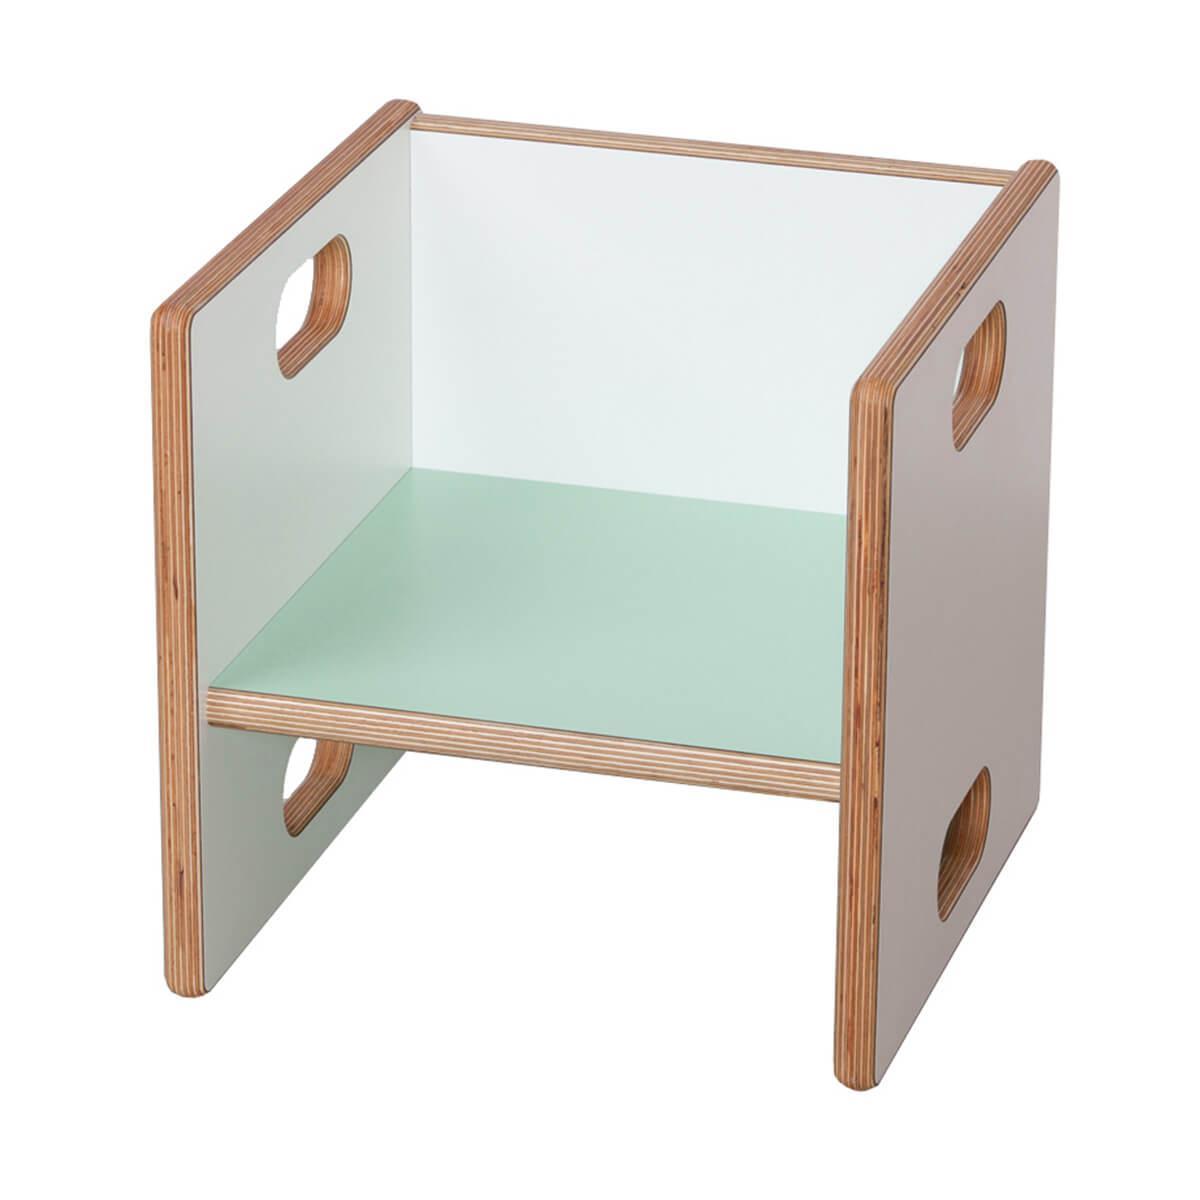 Wandelstuhl DECOR Debreuyn Multiplex weiß HPL - Sitzfläche mint